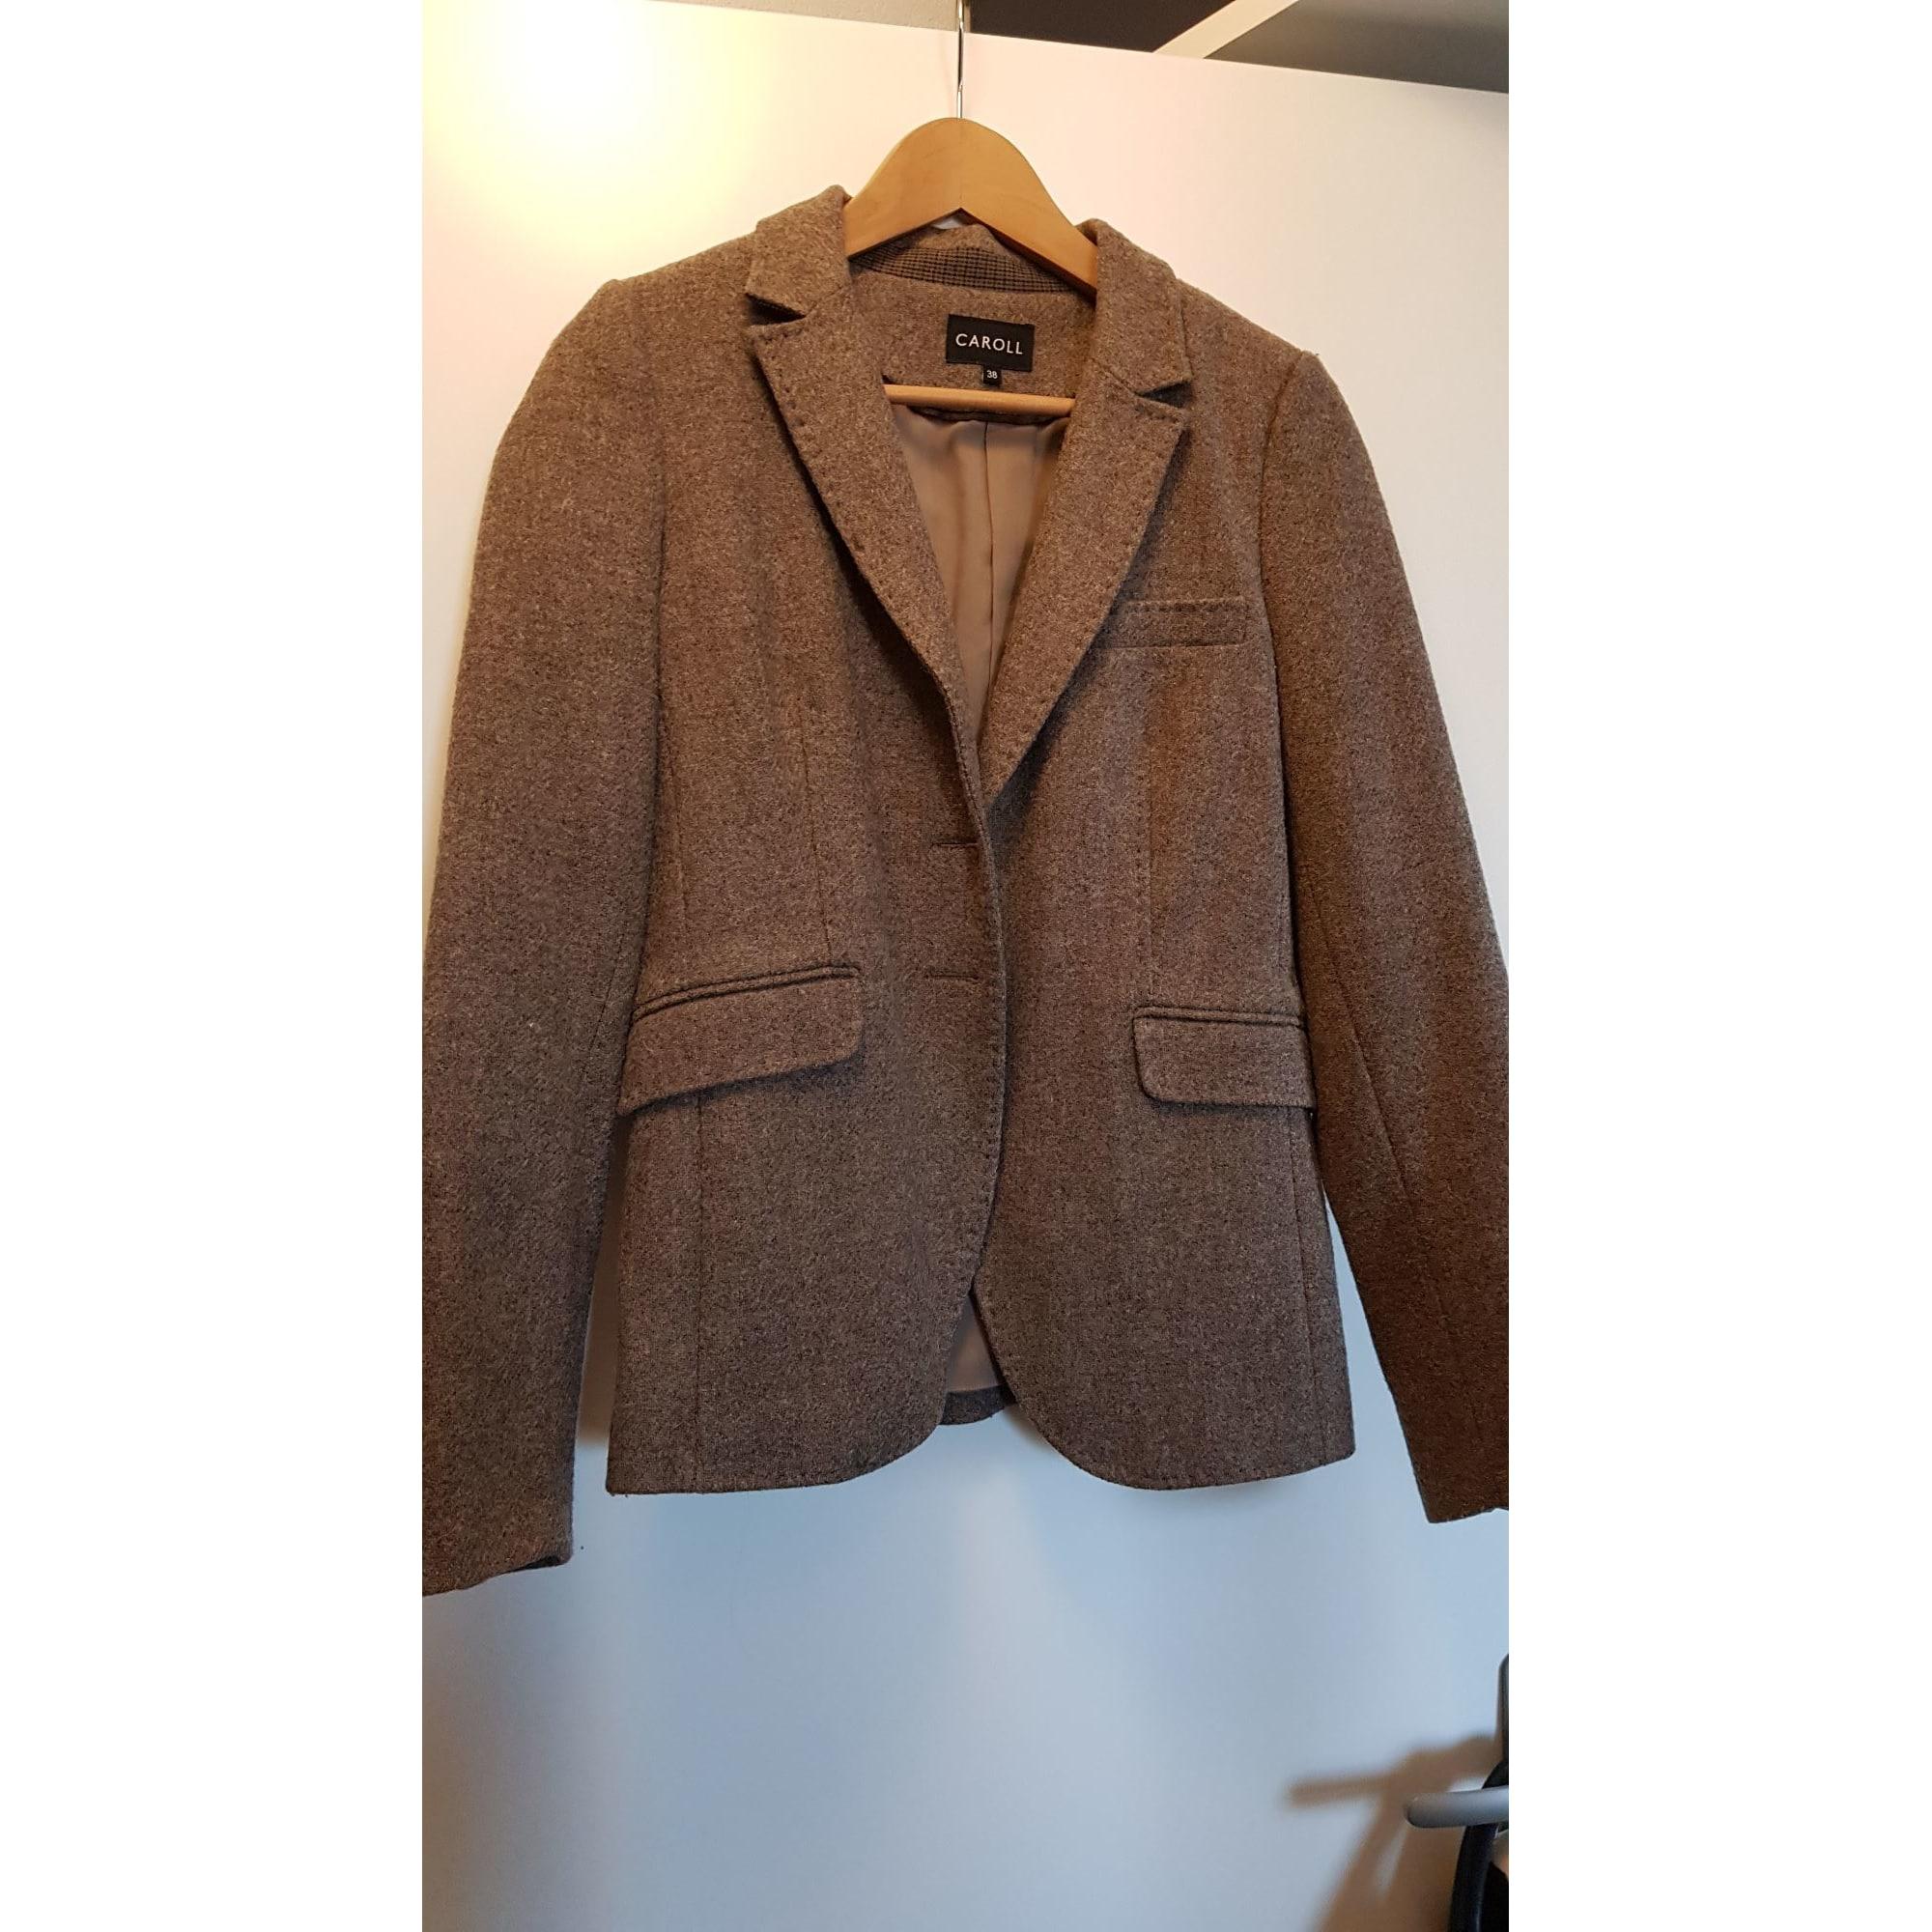 f17f809b64c8 Blazer, veste tailleur CAROLL 38 (M, T2) beige vendu par ...